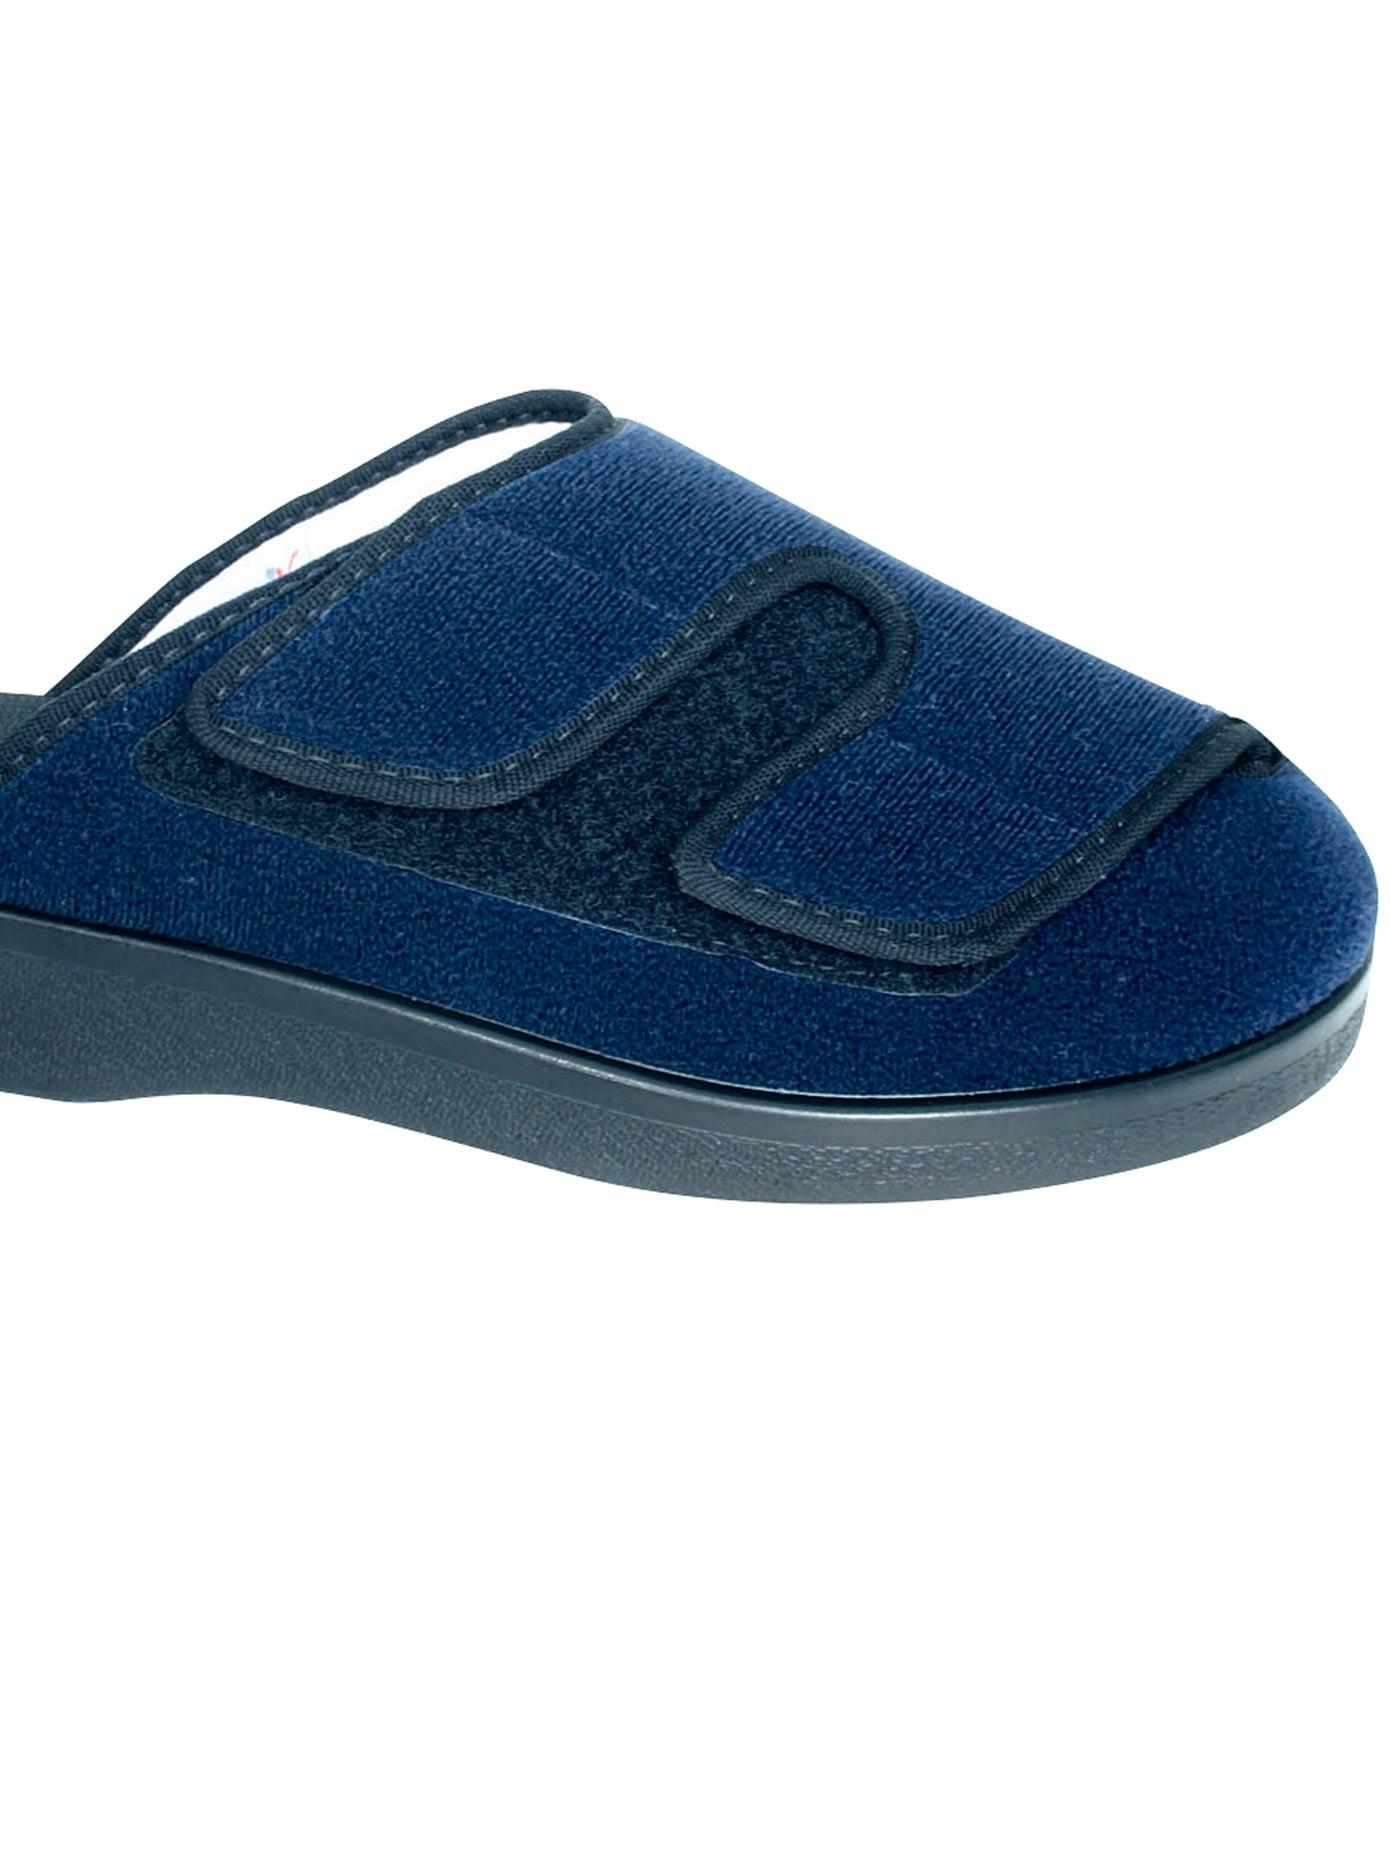 Florett Pantoffel aus Veloursmaterial | Schuhe > Hausschuhe | Blau